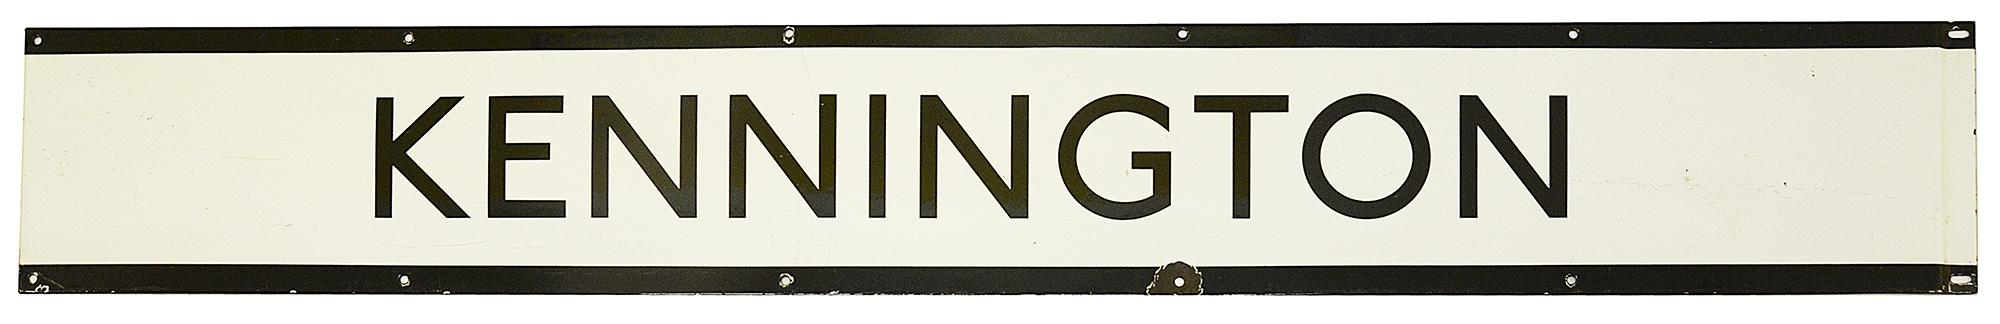 A London Underground enamel station frieze sign for Kennington